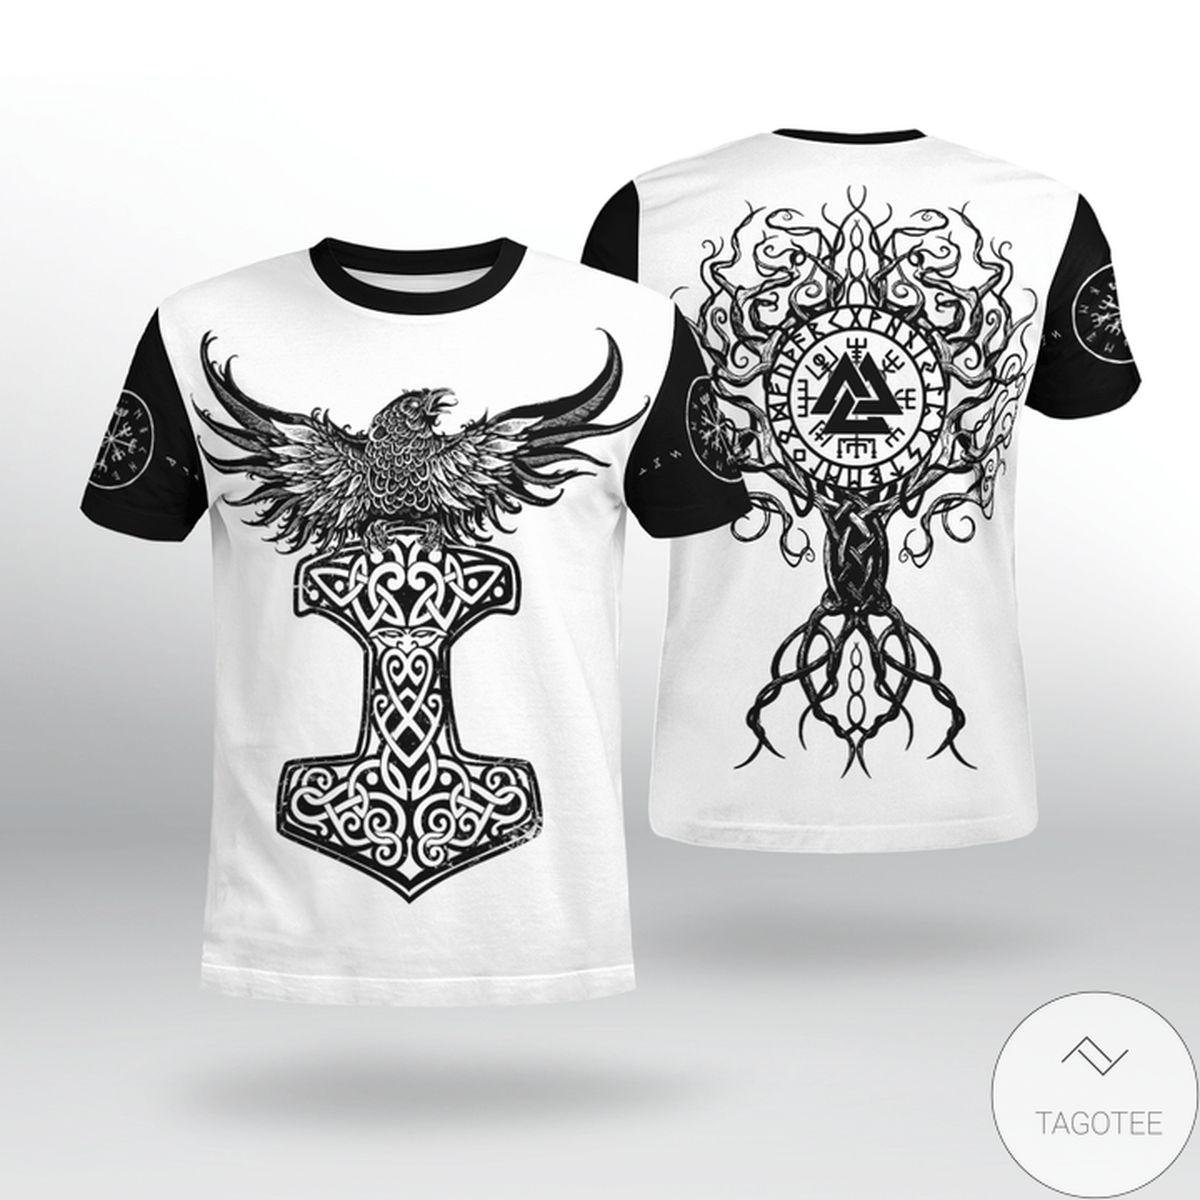 Raven Hammer - Yggdrasil - Tree Of Life - Viking T-shirt